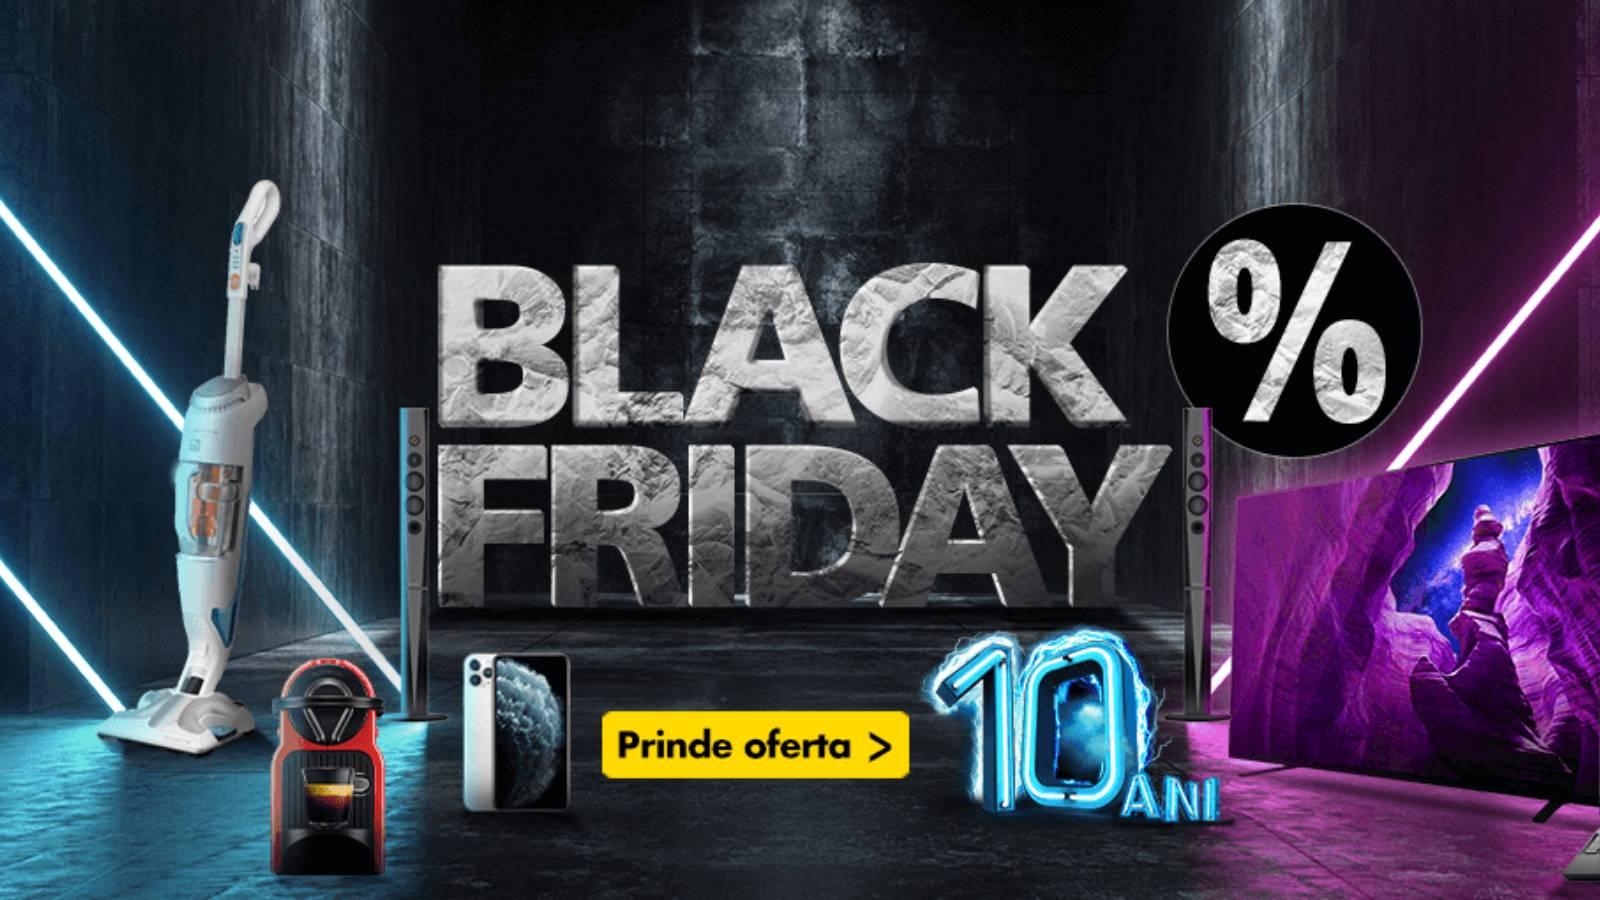 Flanco produse BLACK FRIDAY 2020